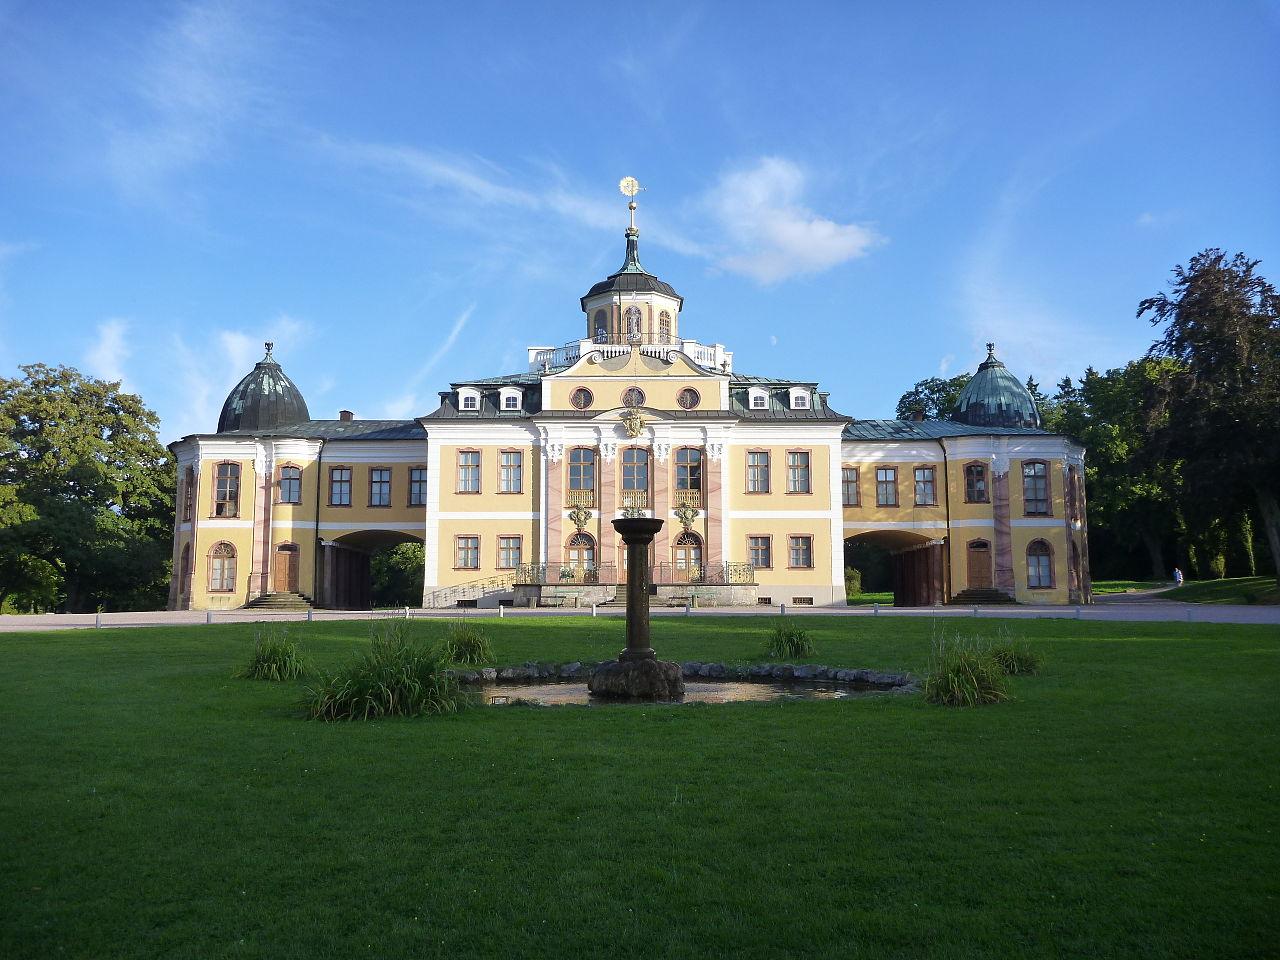 Bild Schloss Belvedere Weimar